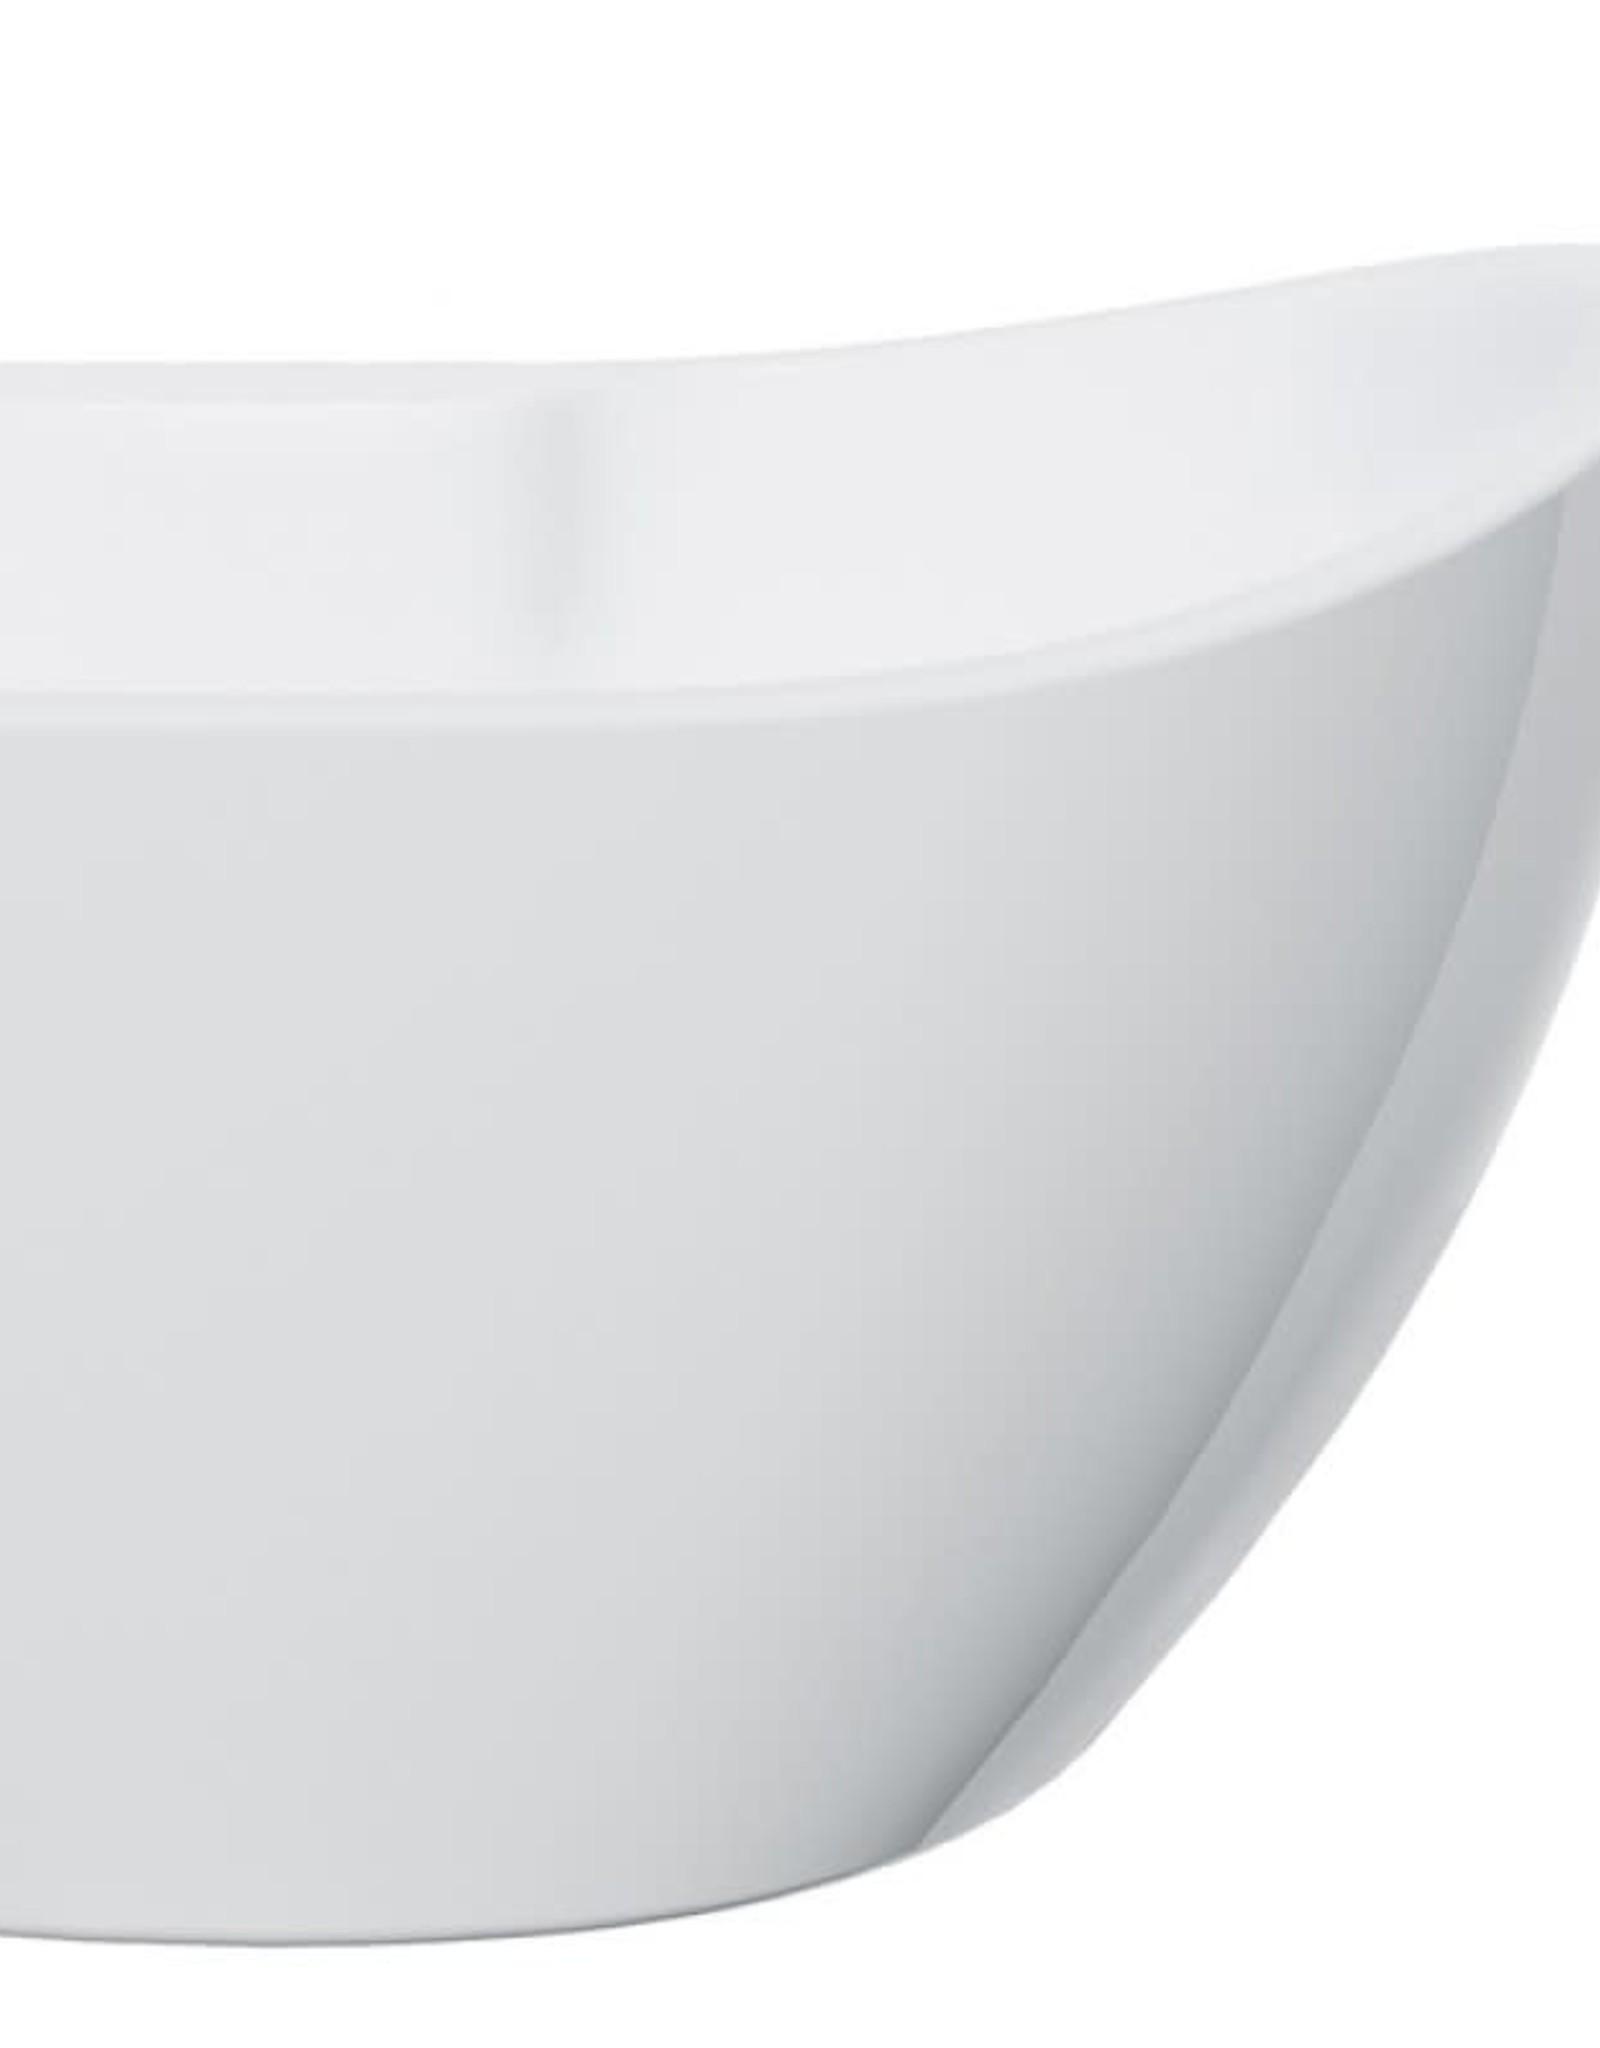 "Bain Signature Bain Signature Serena 56"" Freestanding Tub"